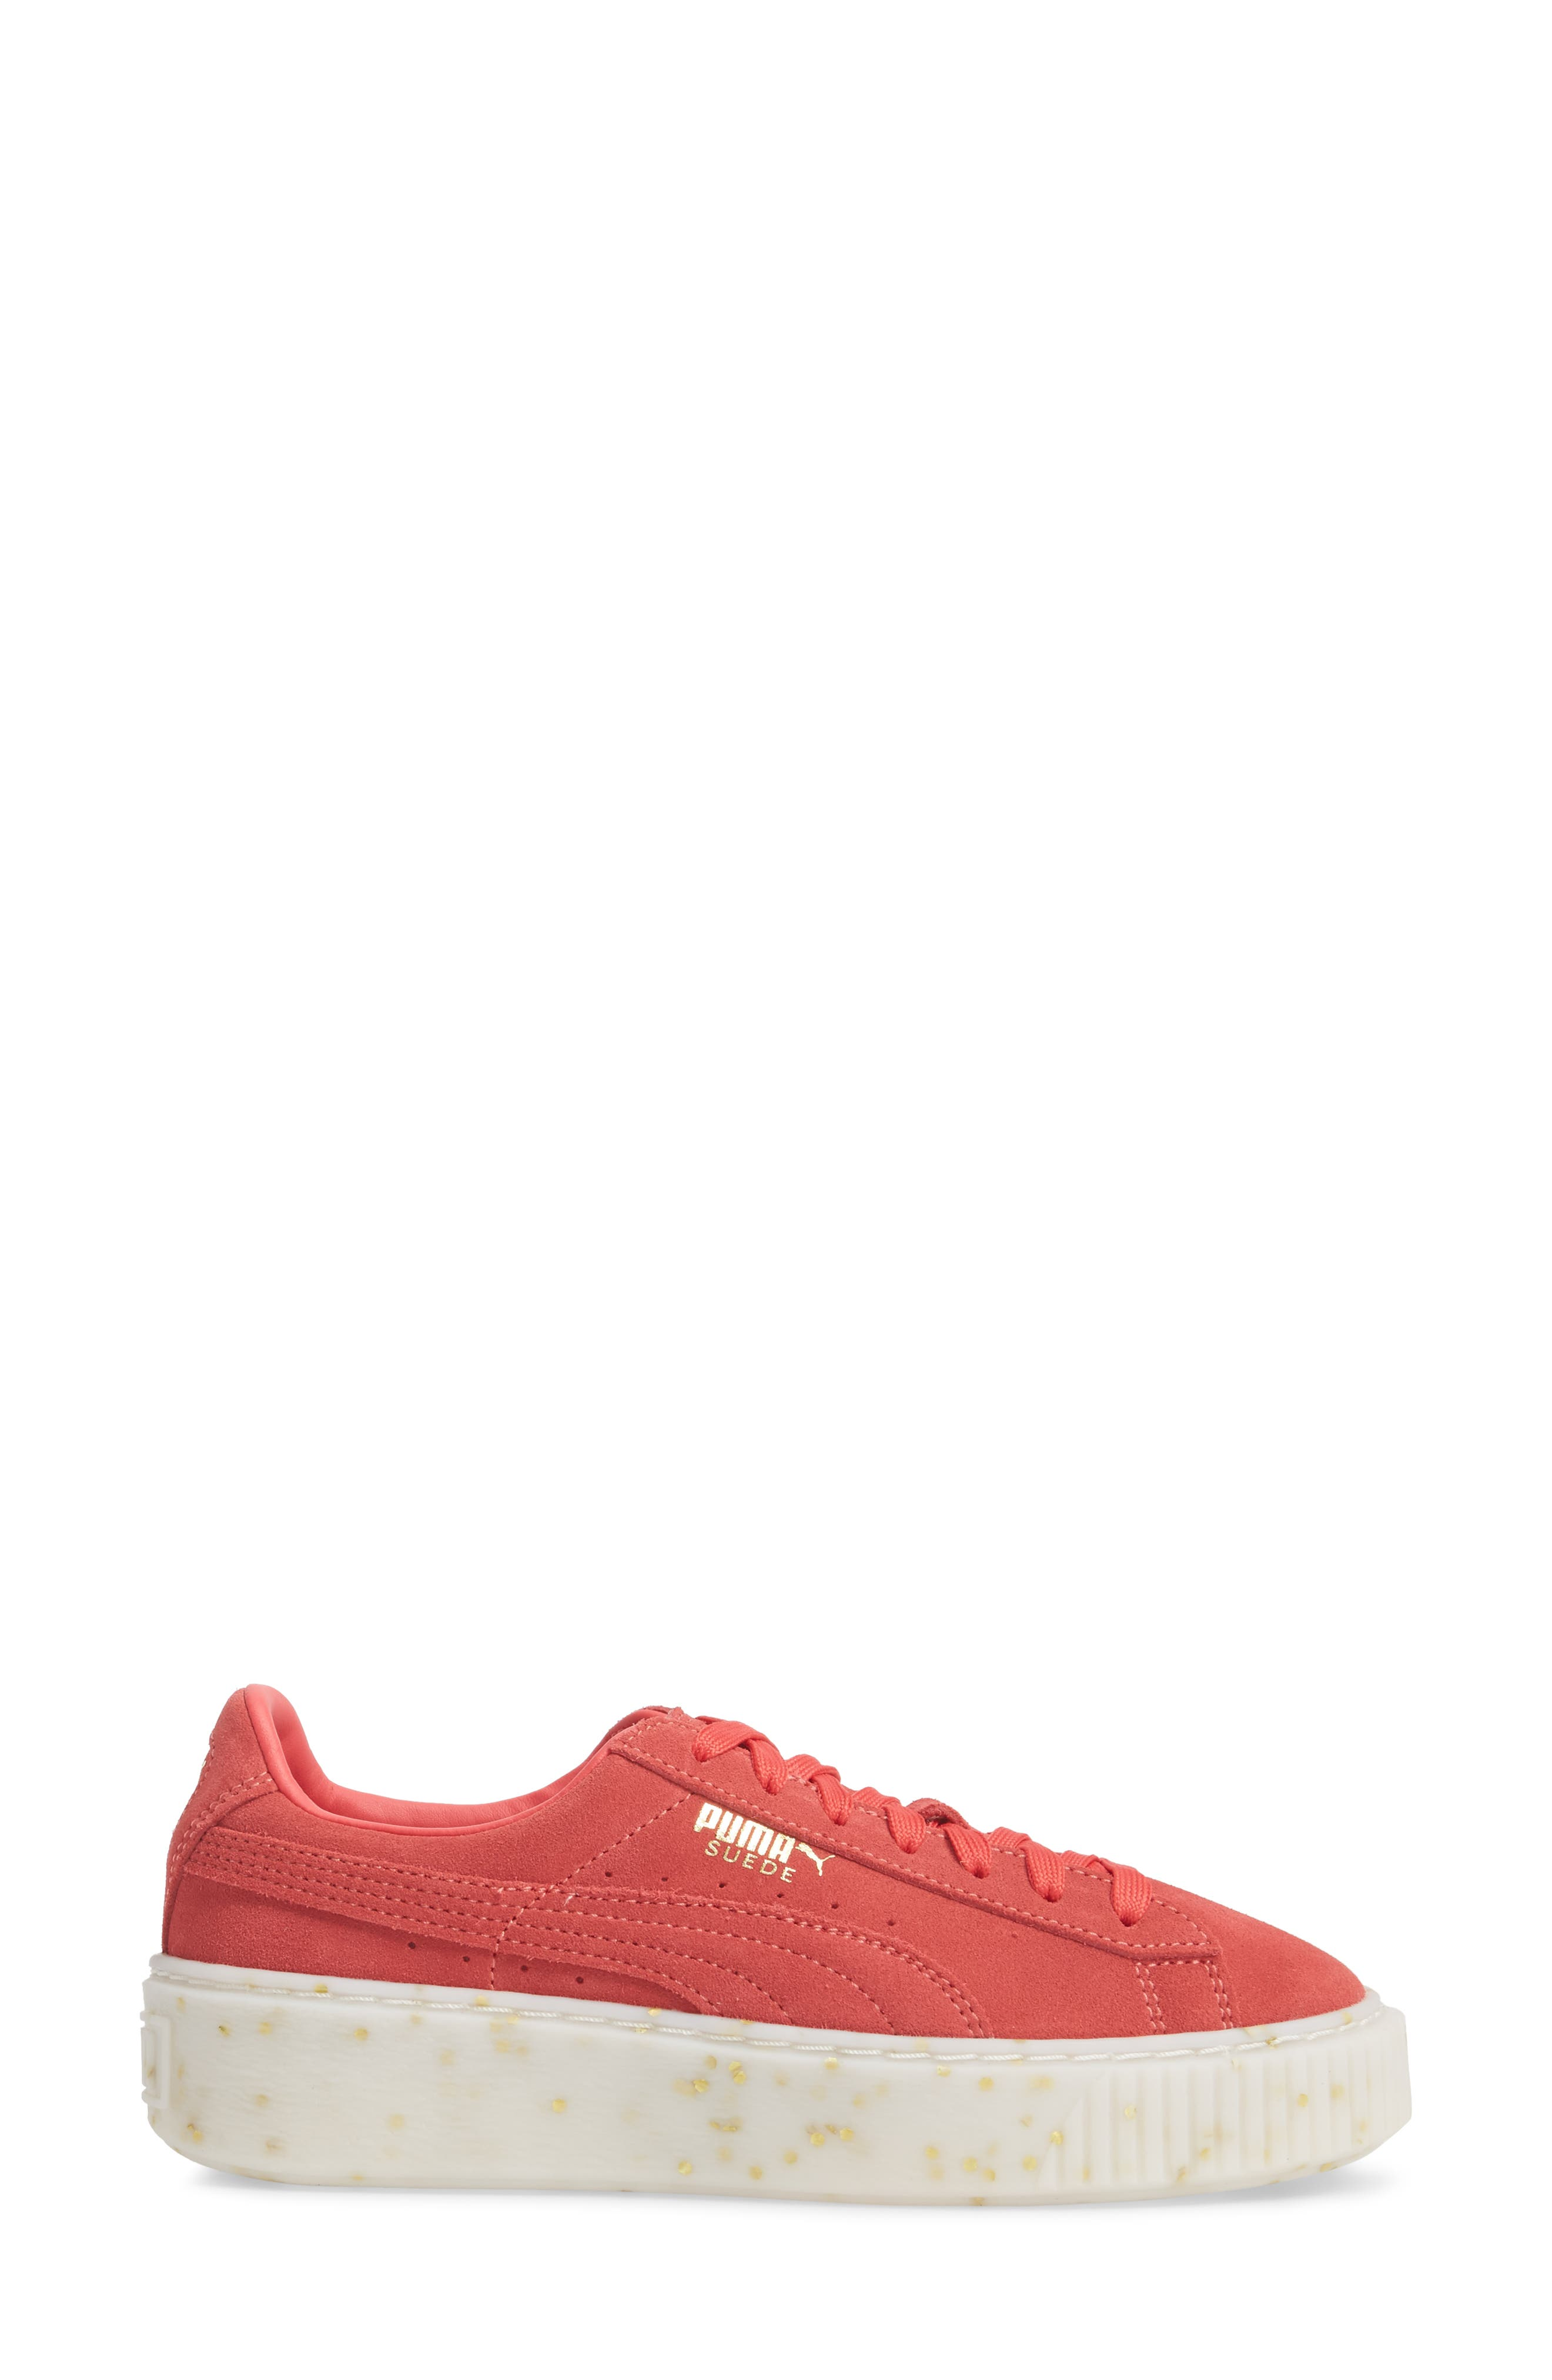 PUMA, Suede Platform Sneaker, Alternate thumbnail 3, color, PARADISE PINK/ TEAM GOLD